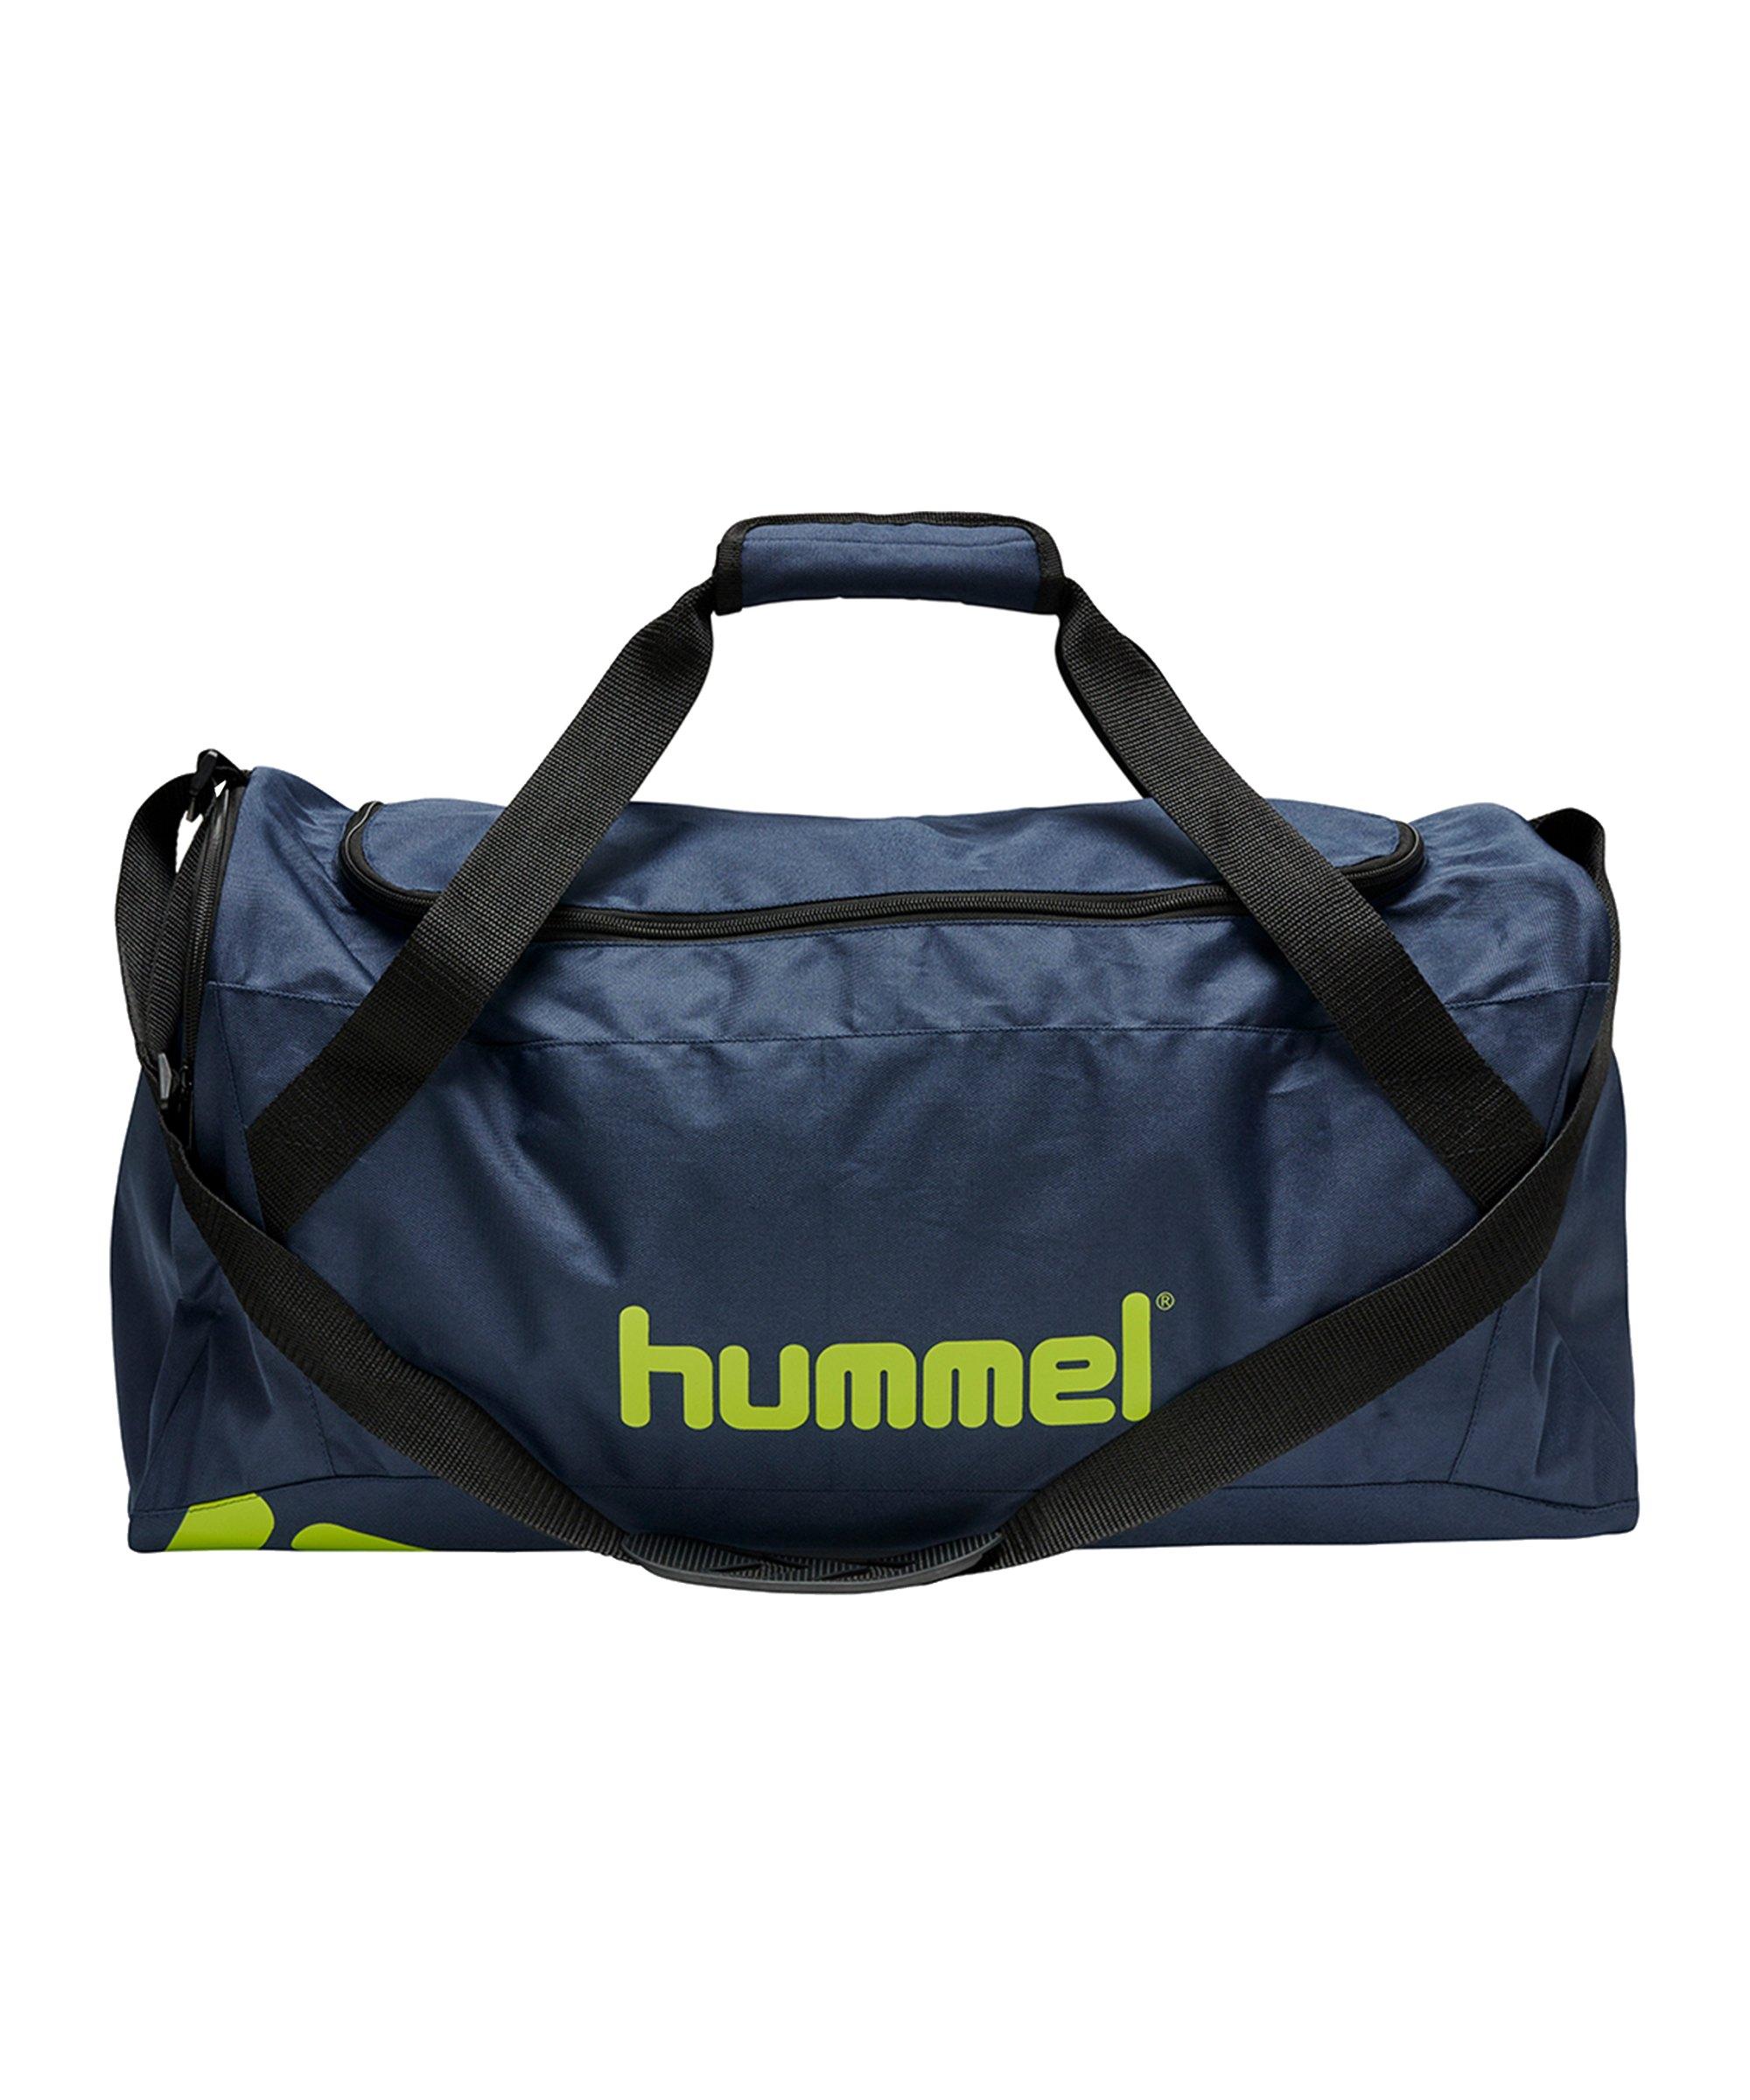 Hummel Core Bag Sporttasche Blau F6616 Gr. S - blau